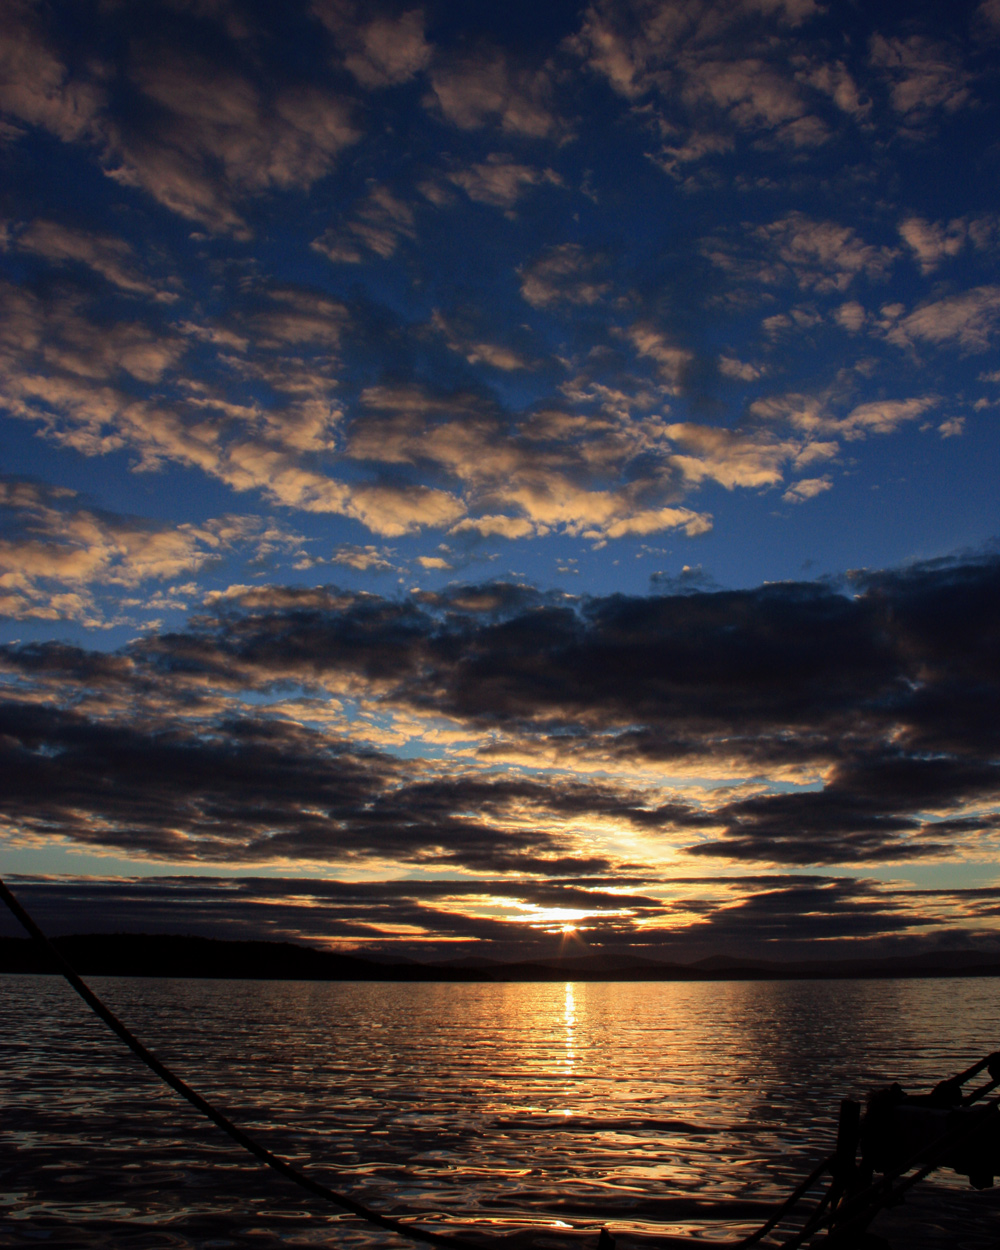 port-davey-sunset.jpg